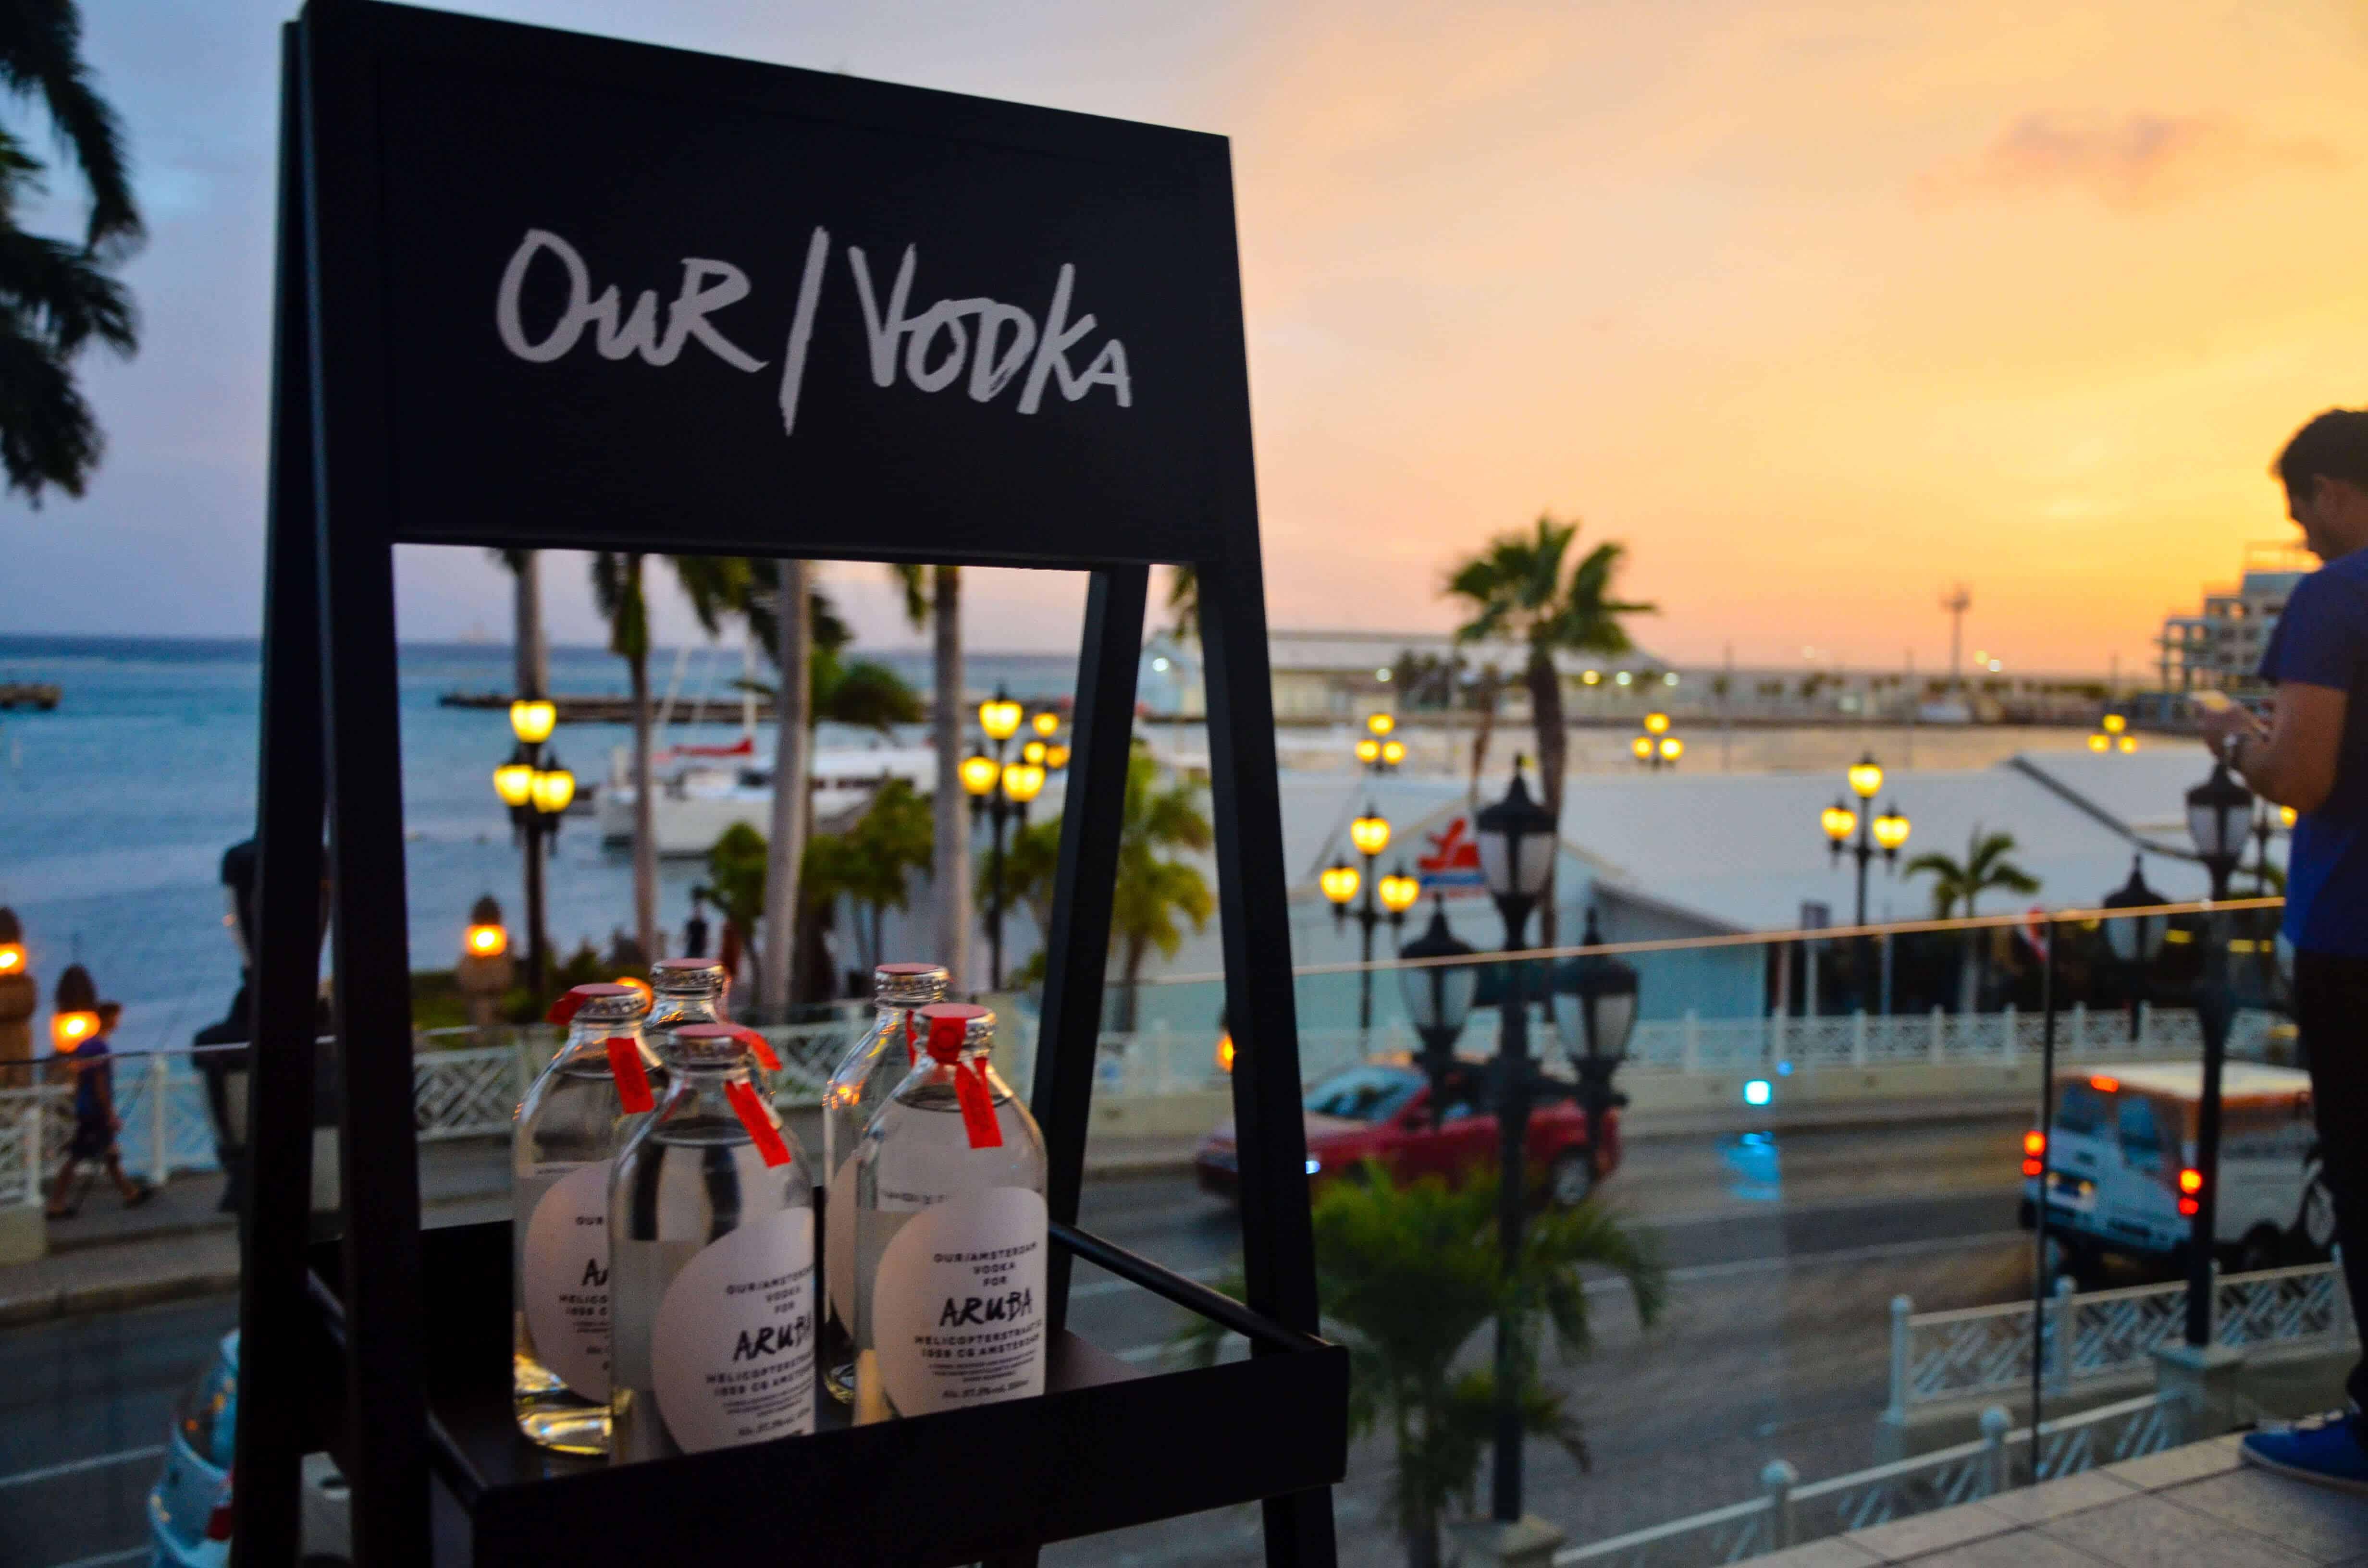 Fendaux Our/Vodka Aruba